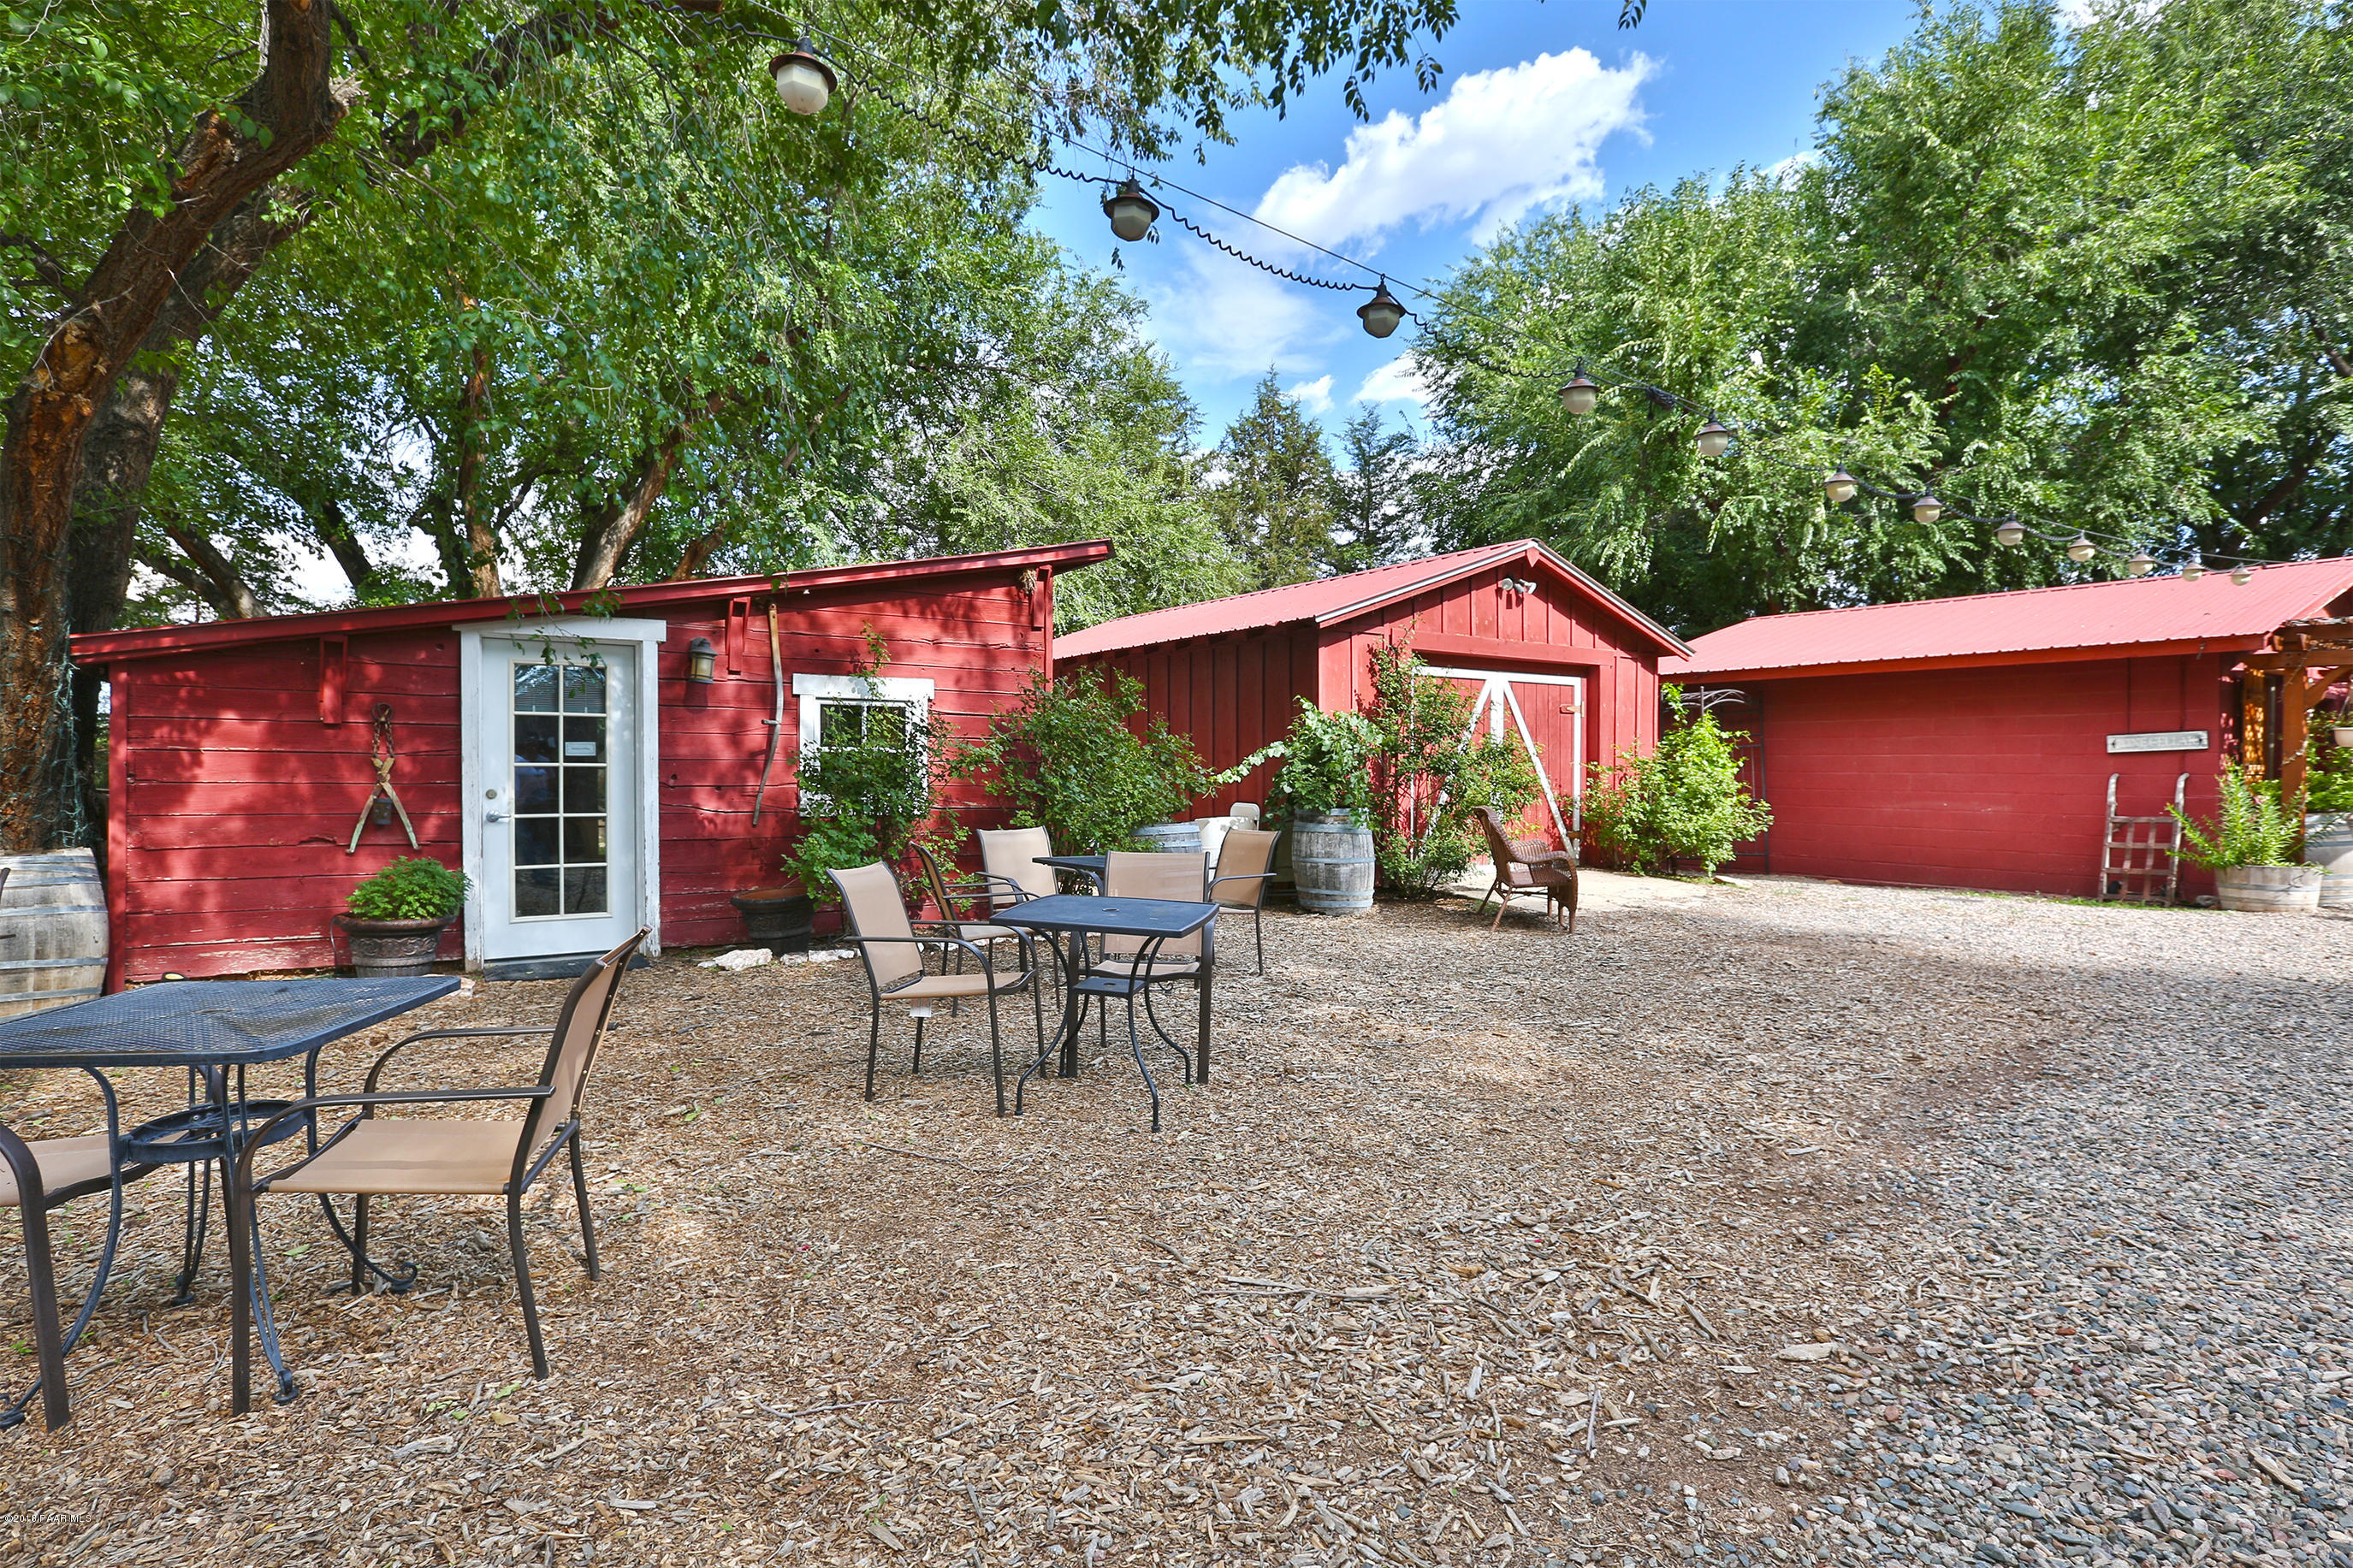 2515 E Rd 1 Chino Valley, AZ 86323 - MLS #: 1016048